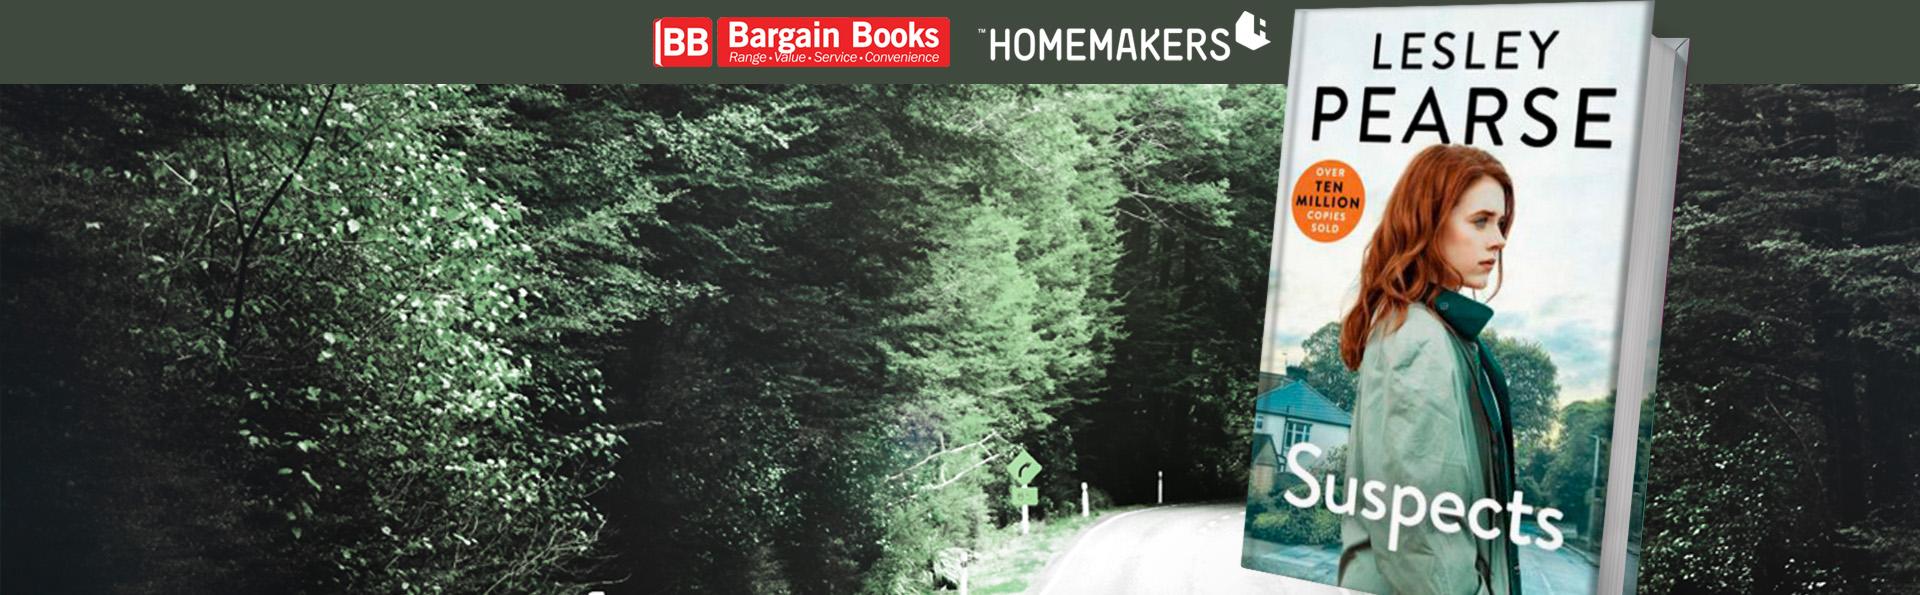 bargain books lesley pearse